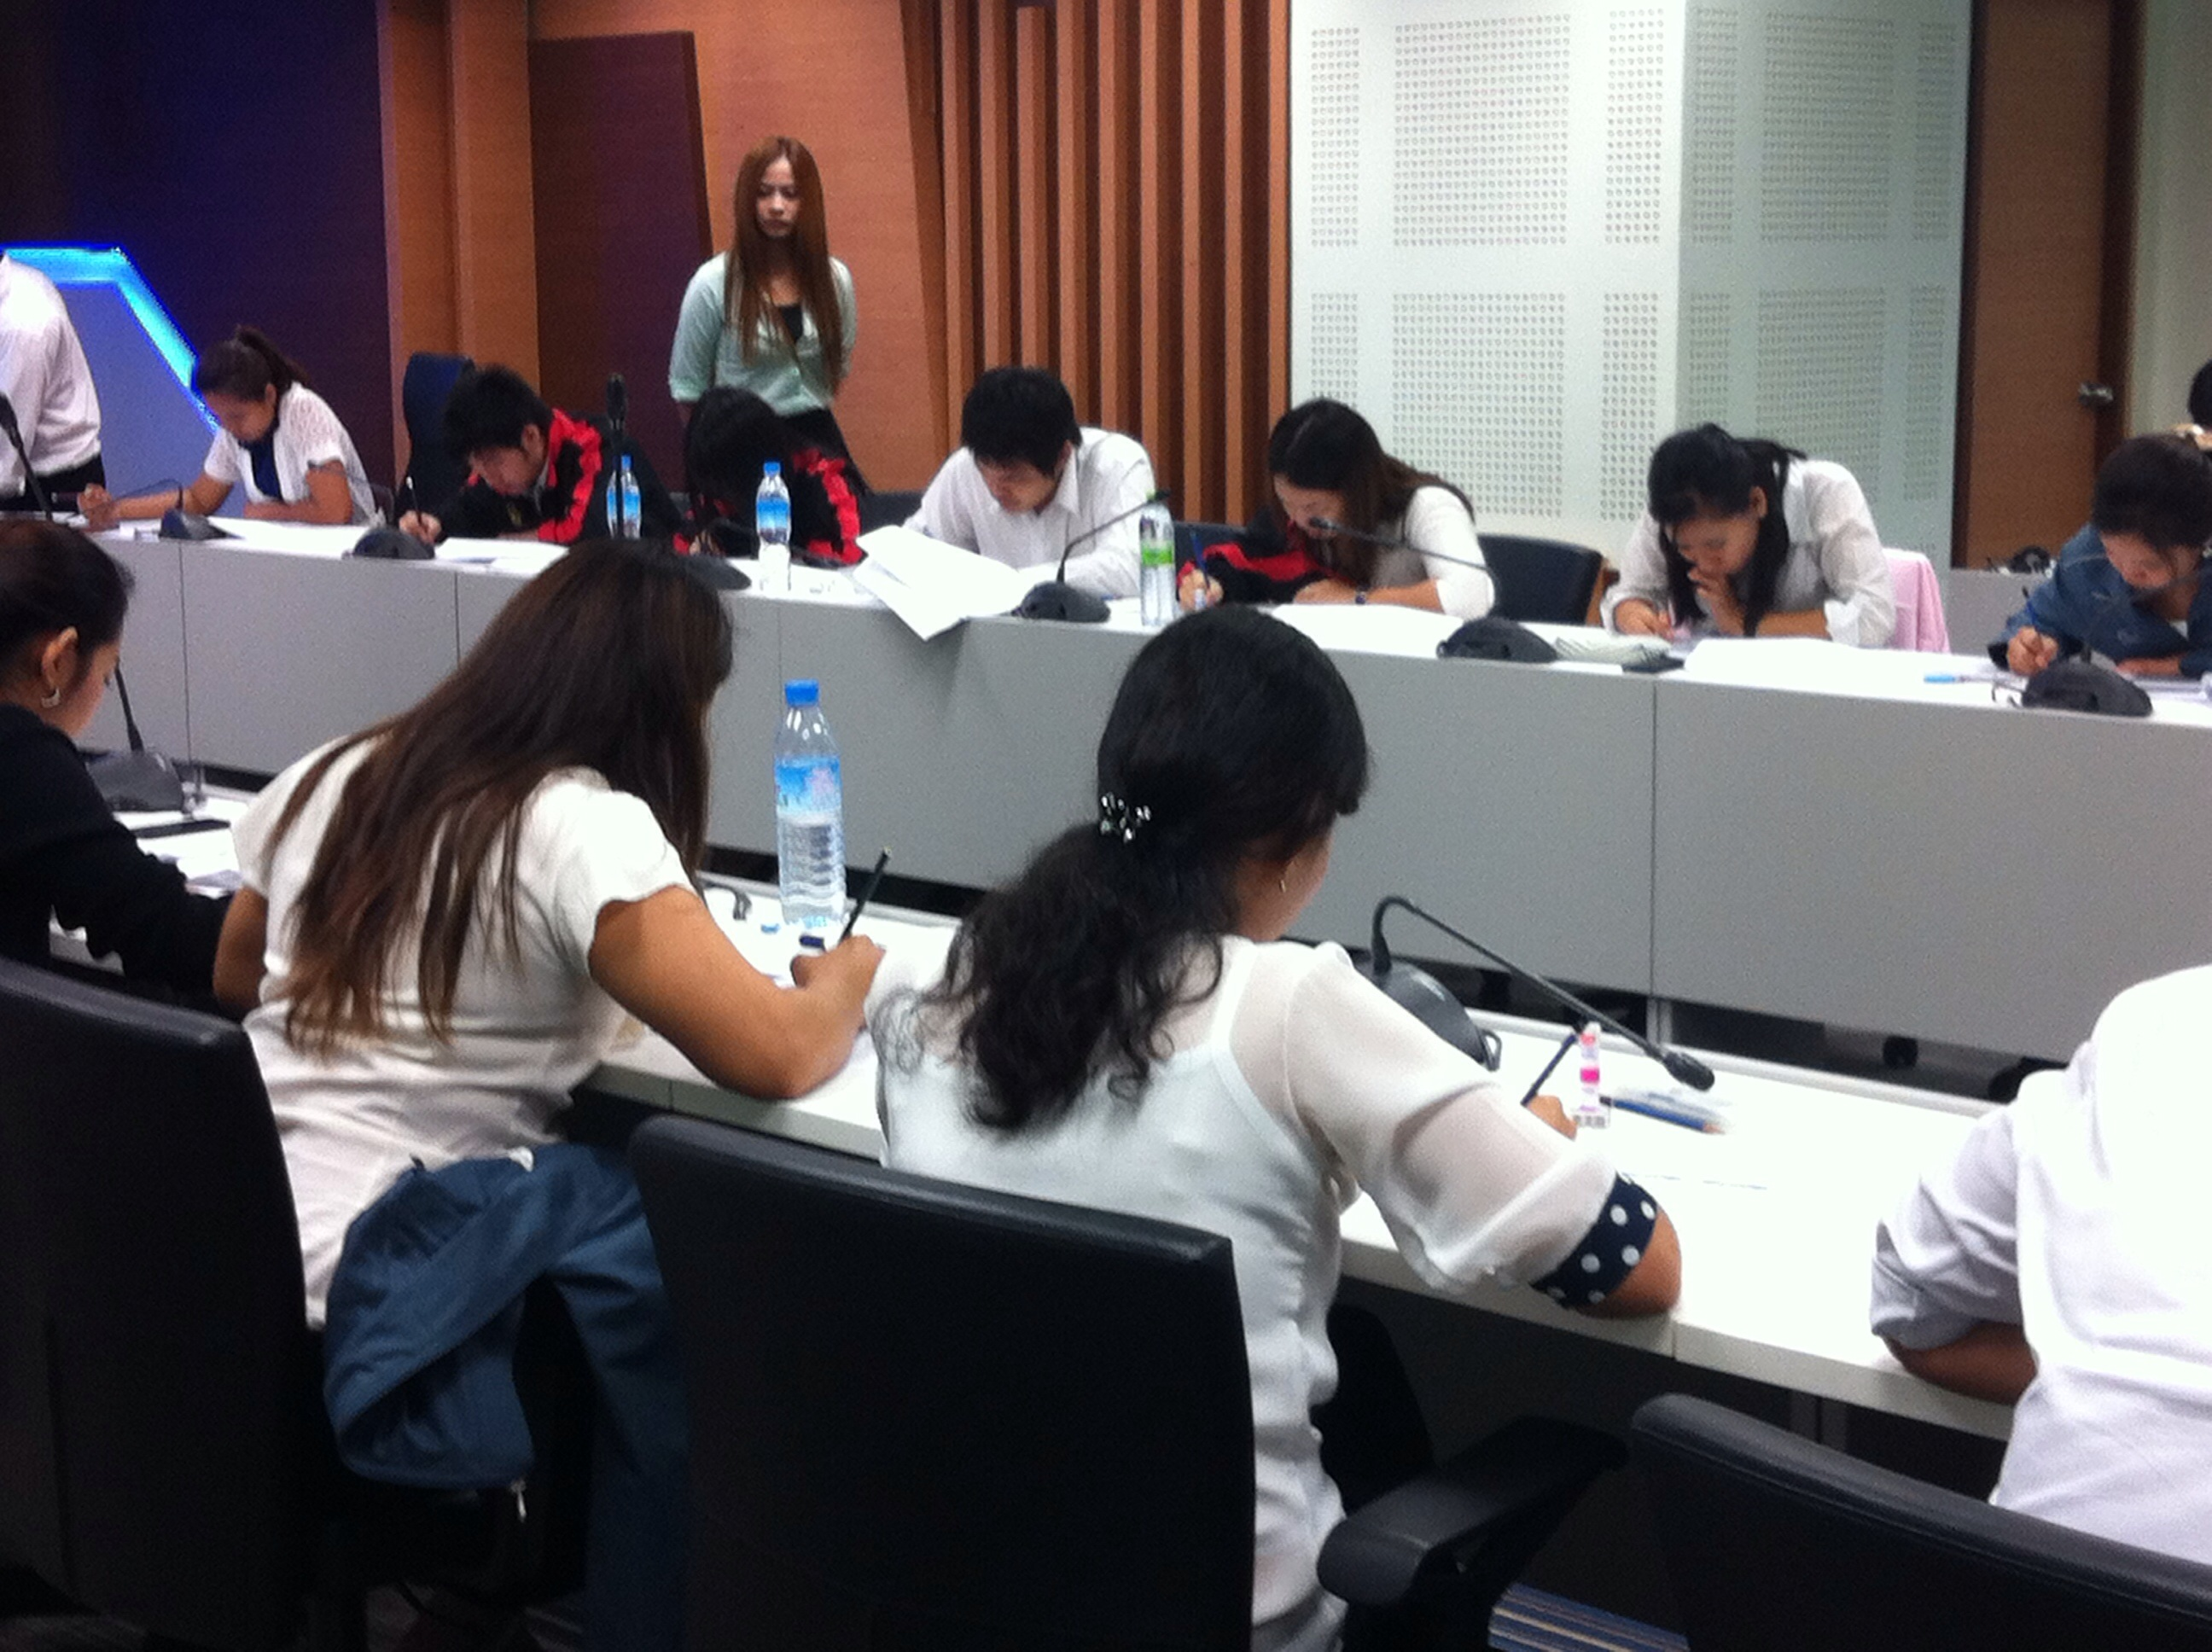 TOEIC Post-Test สำหรับ TOEIC Corporate Programs ที่ กกท.